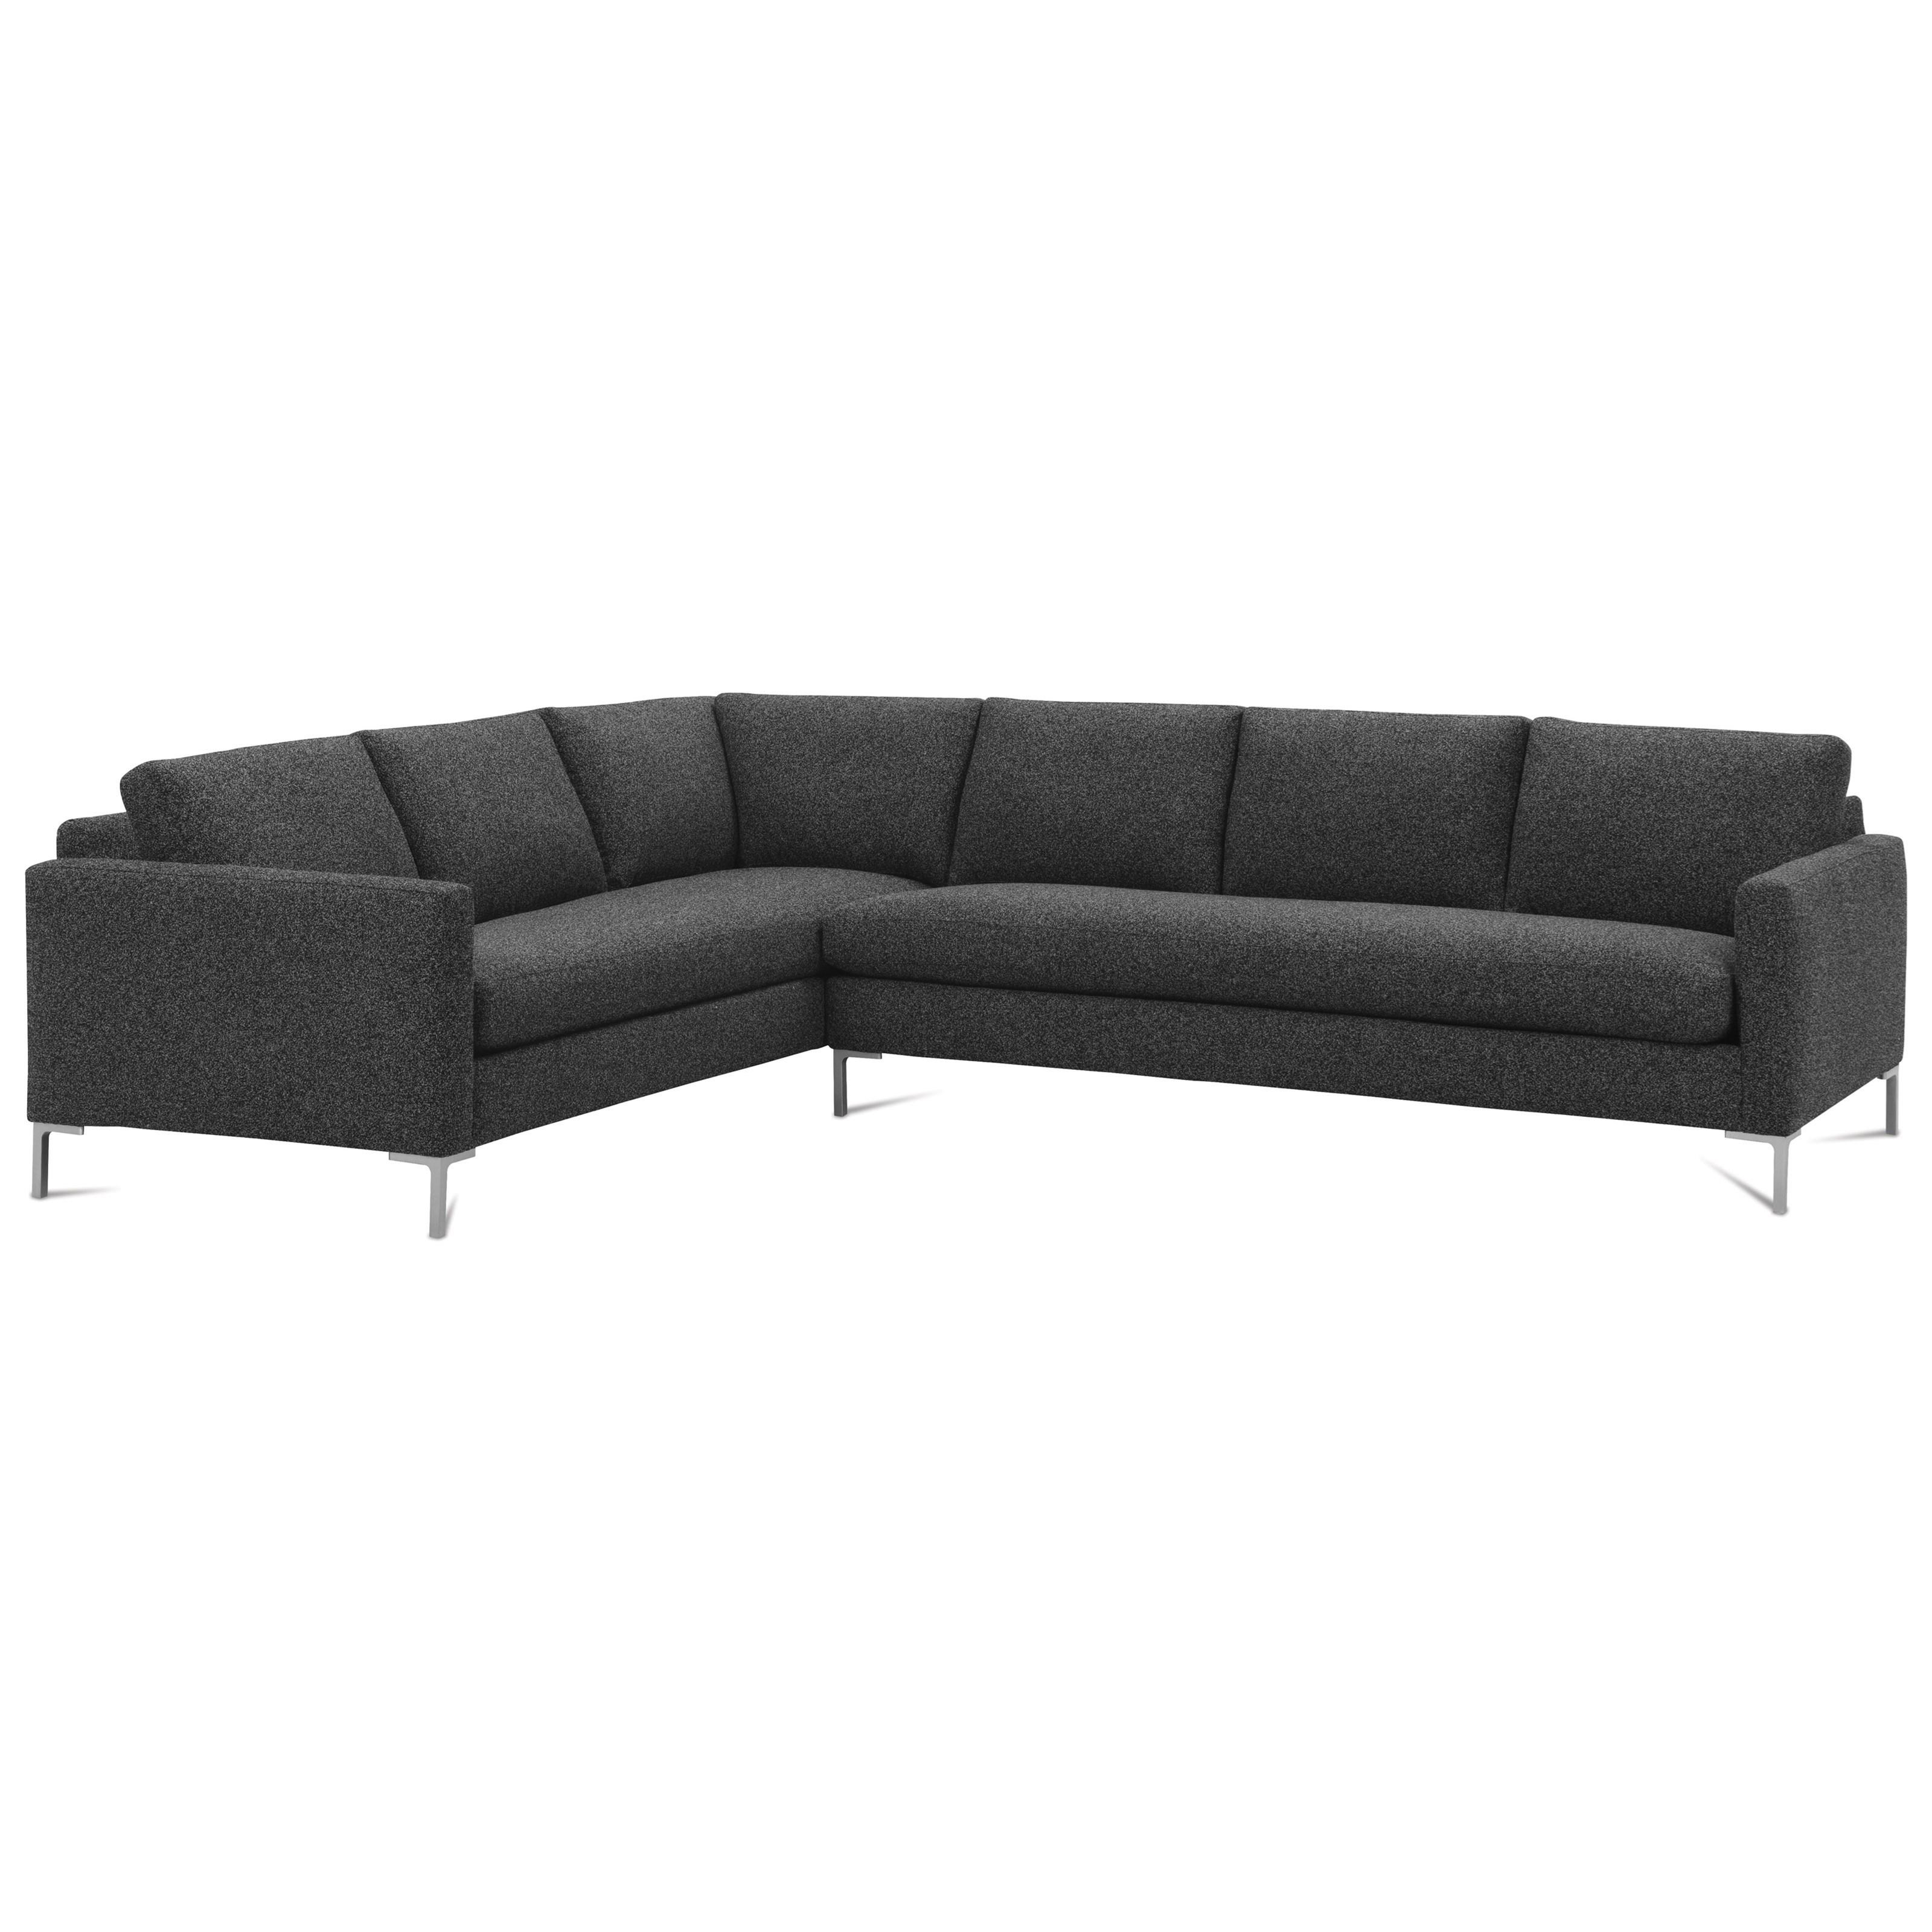 Beau Rowe Modern MixSectional Sofa ...